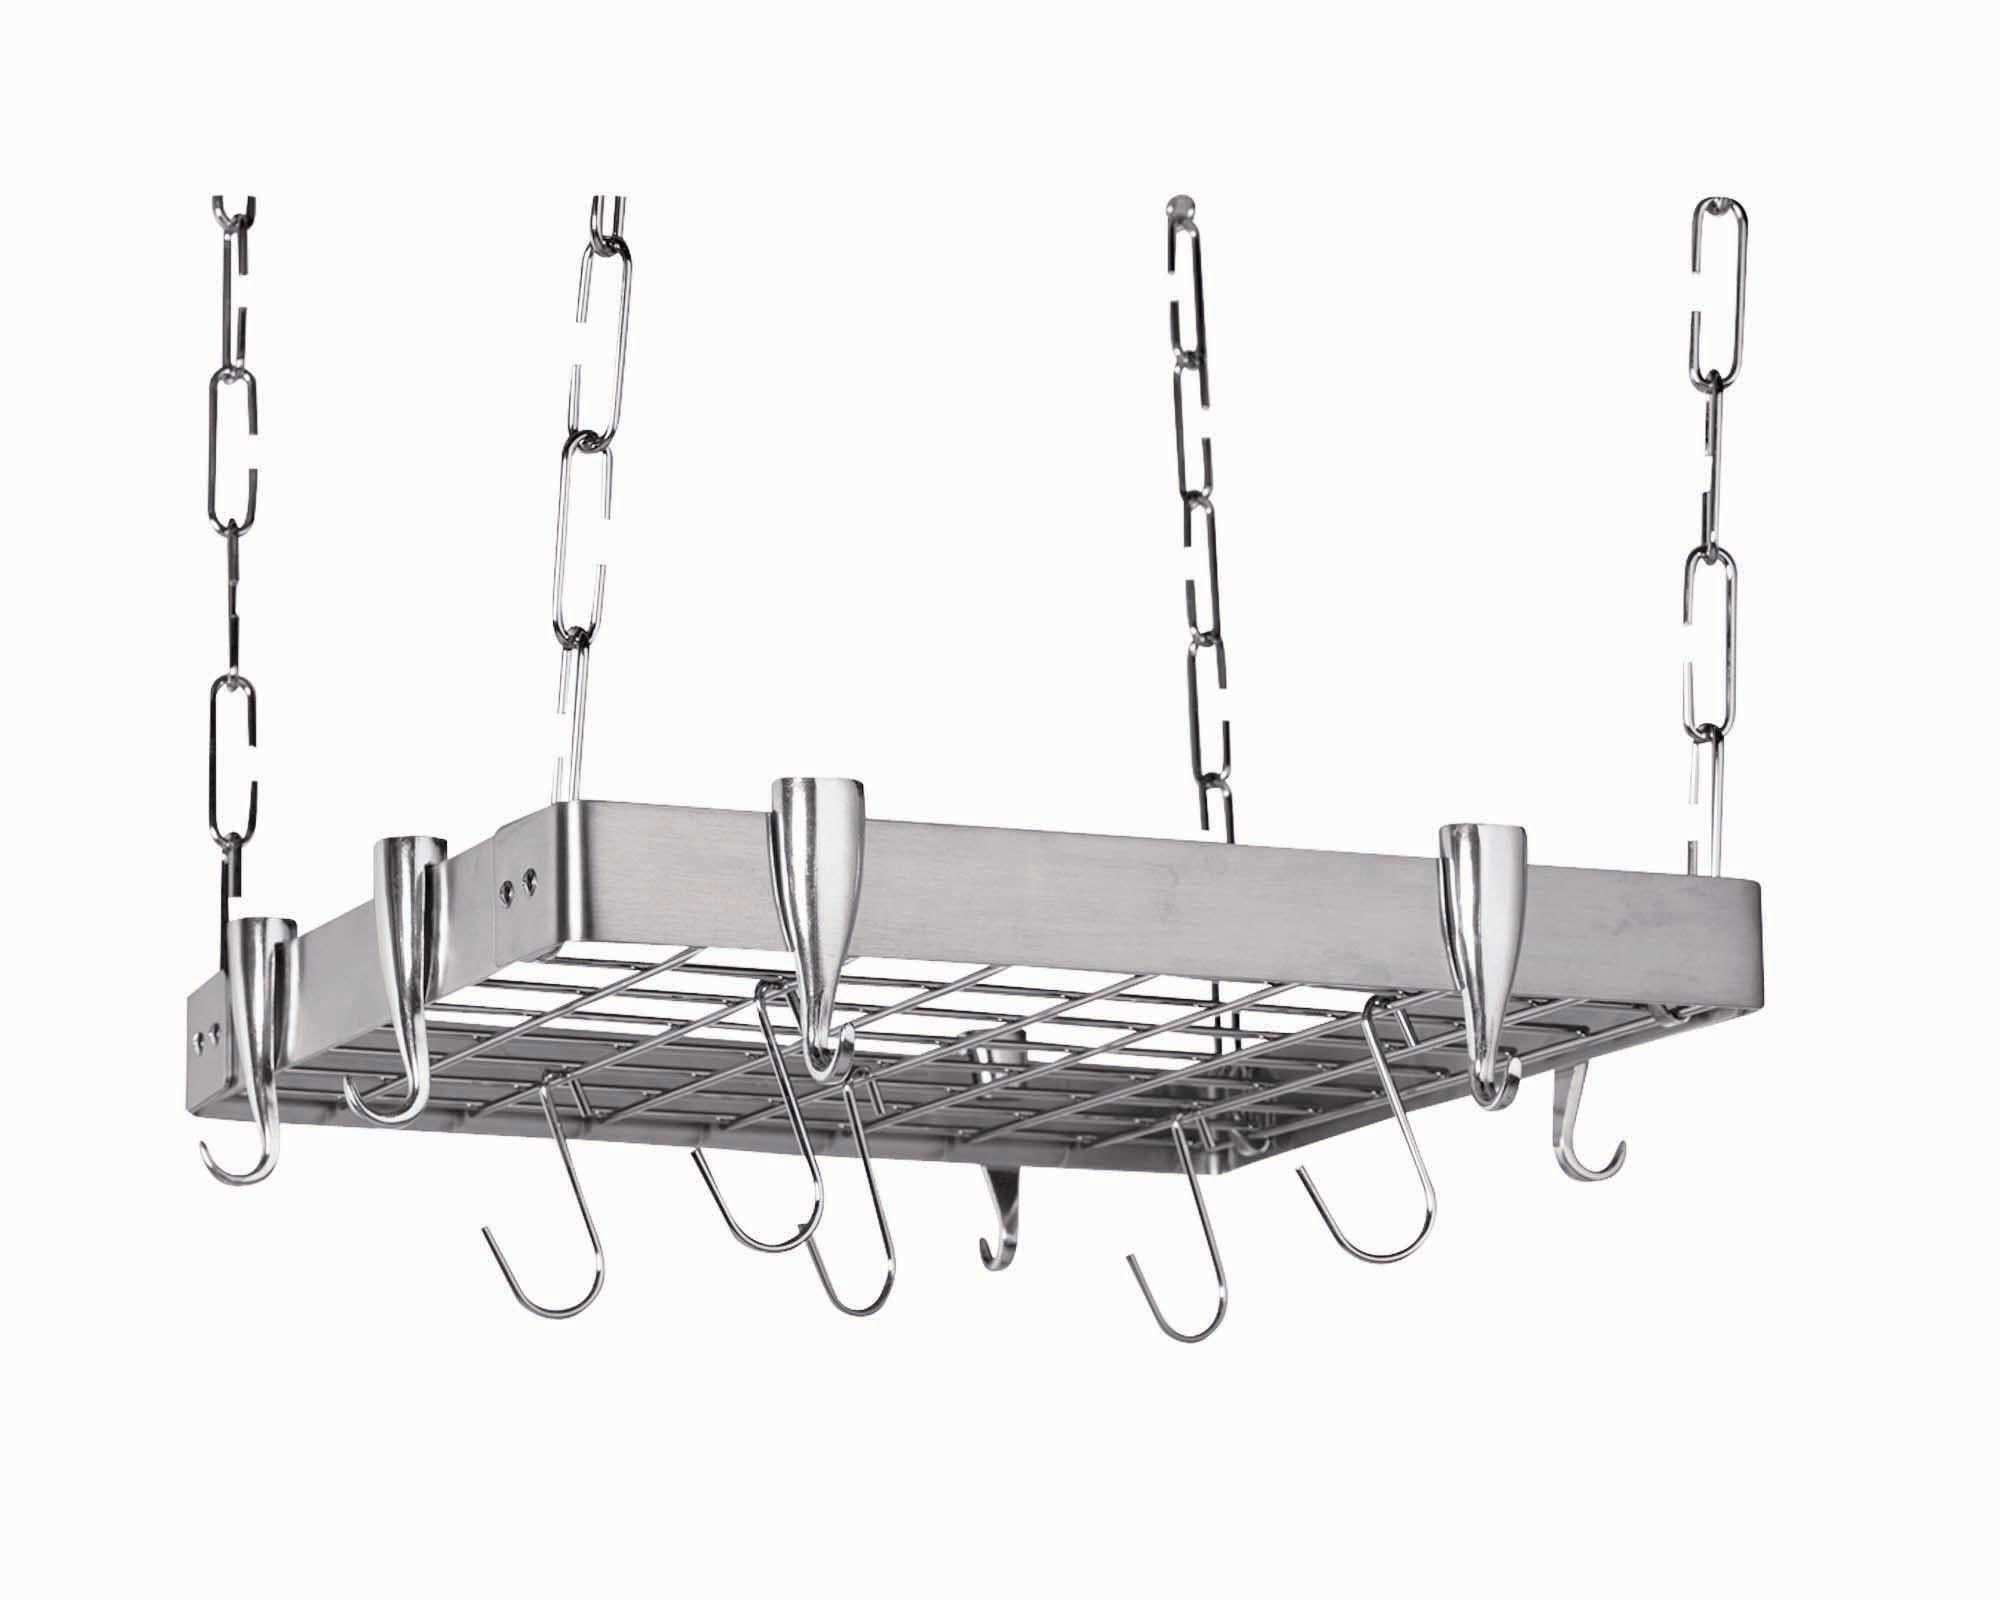 Stainless Steel Square Pot Rack Pot Rack Hanging Hanging Pots Pot Rack